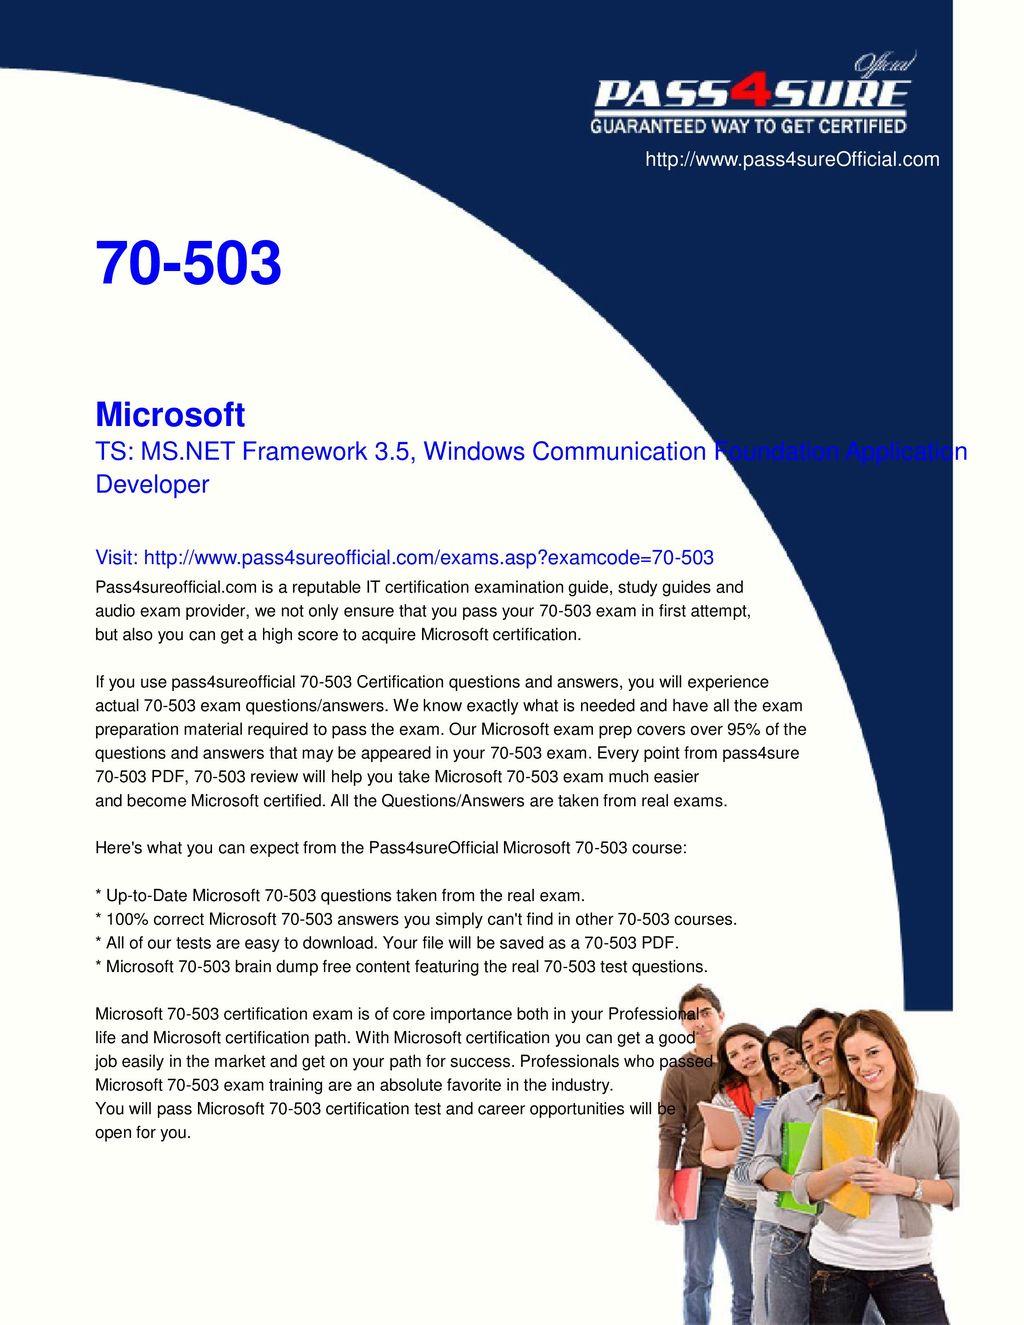 Microsoft Ts Ms Framework 35 Windows Communication Foundation